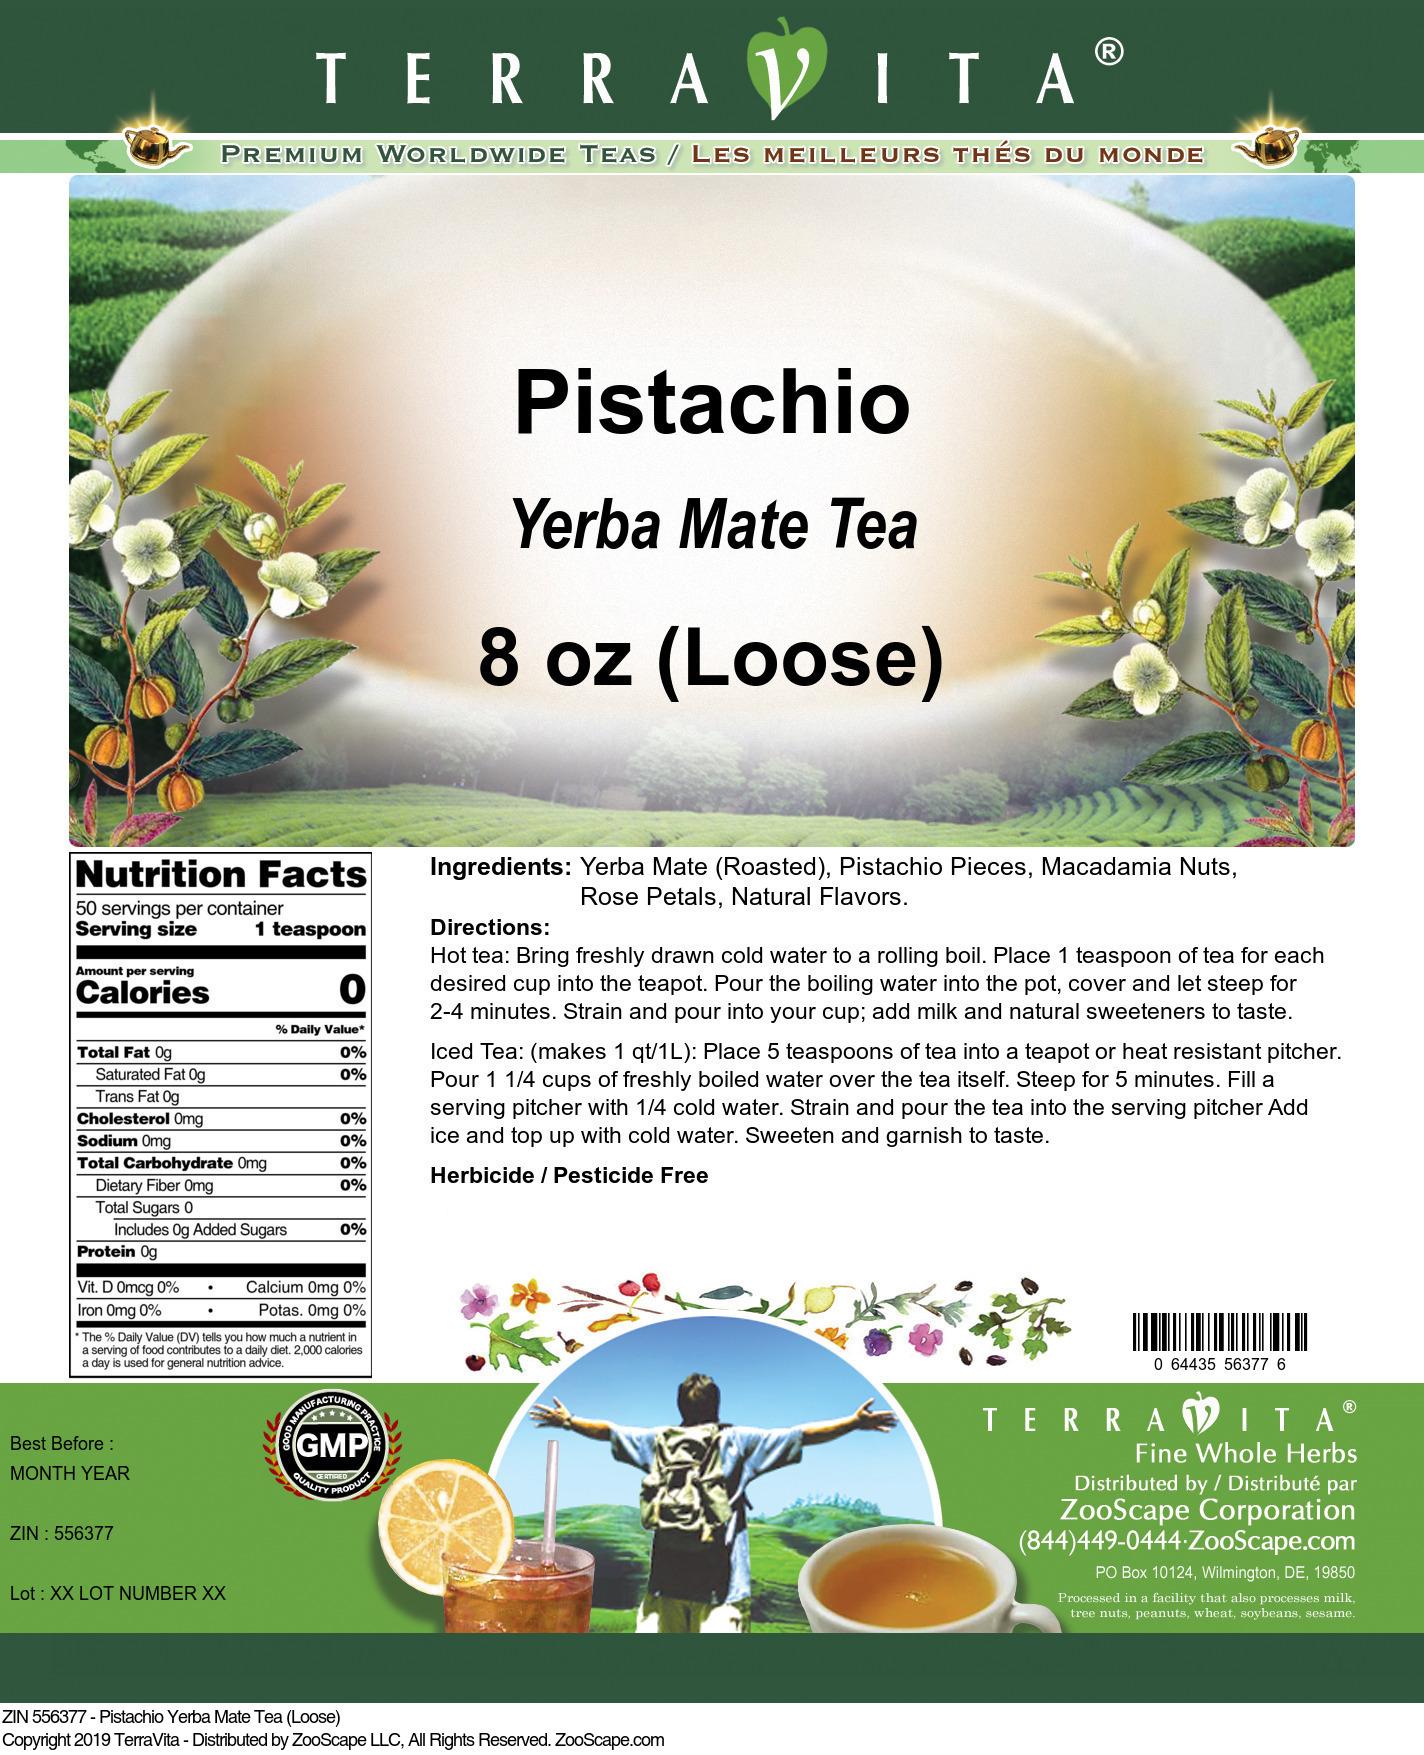 Pistachio Yerba Mate Tea (Loose)